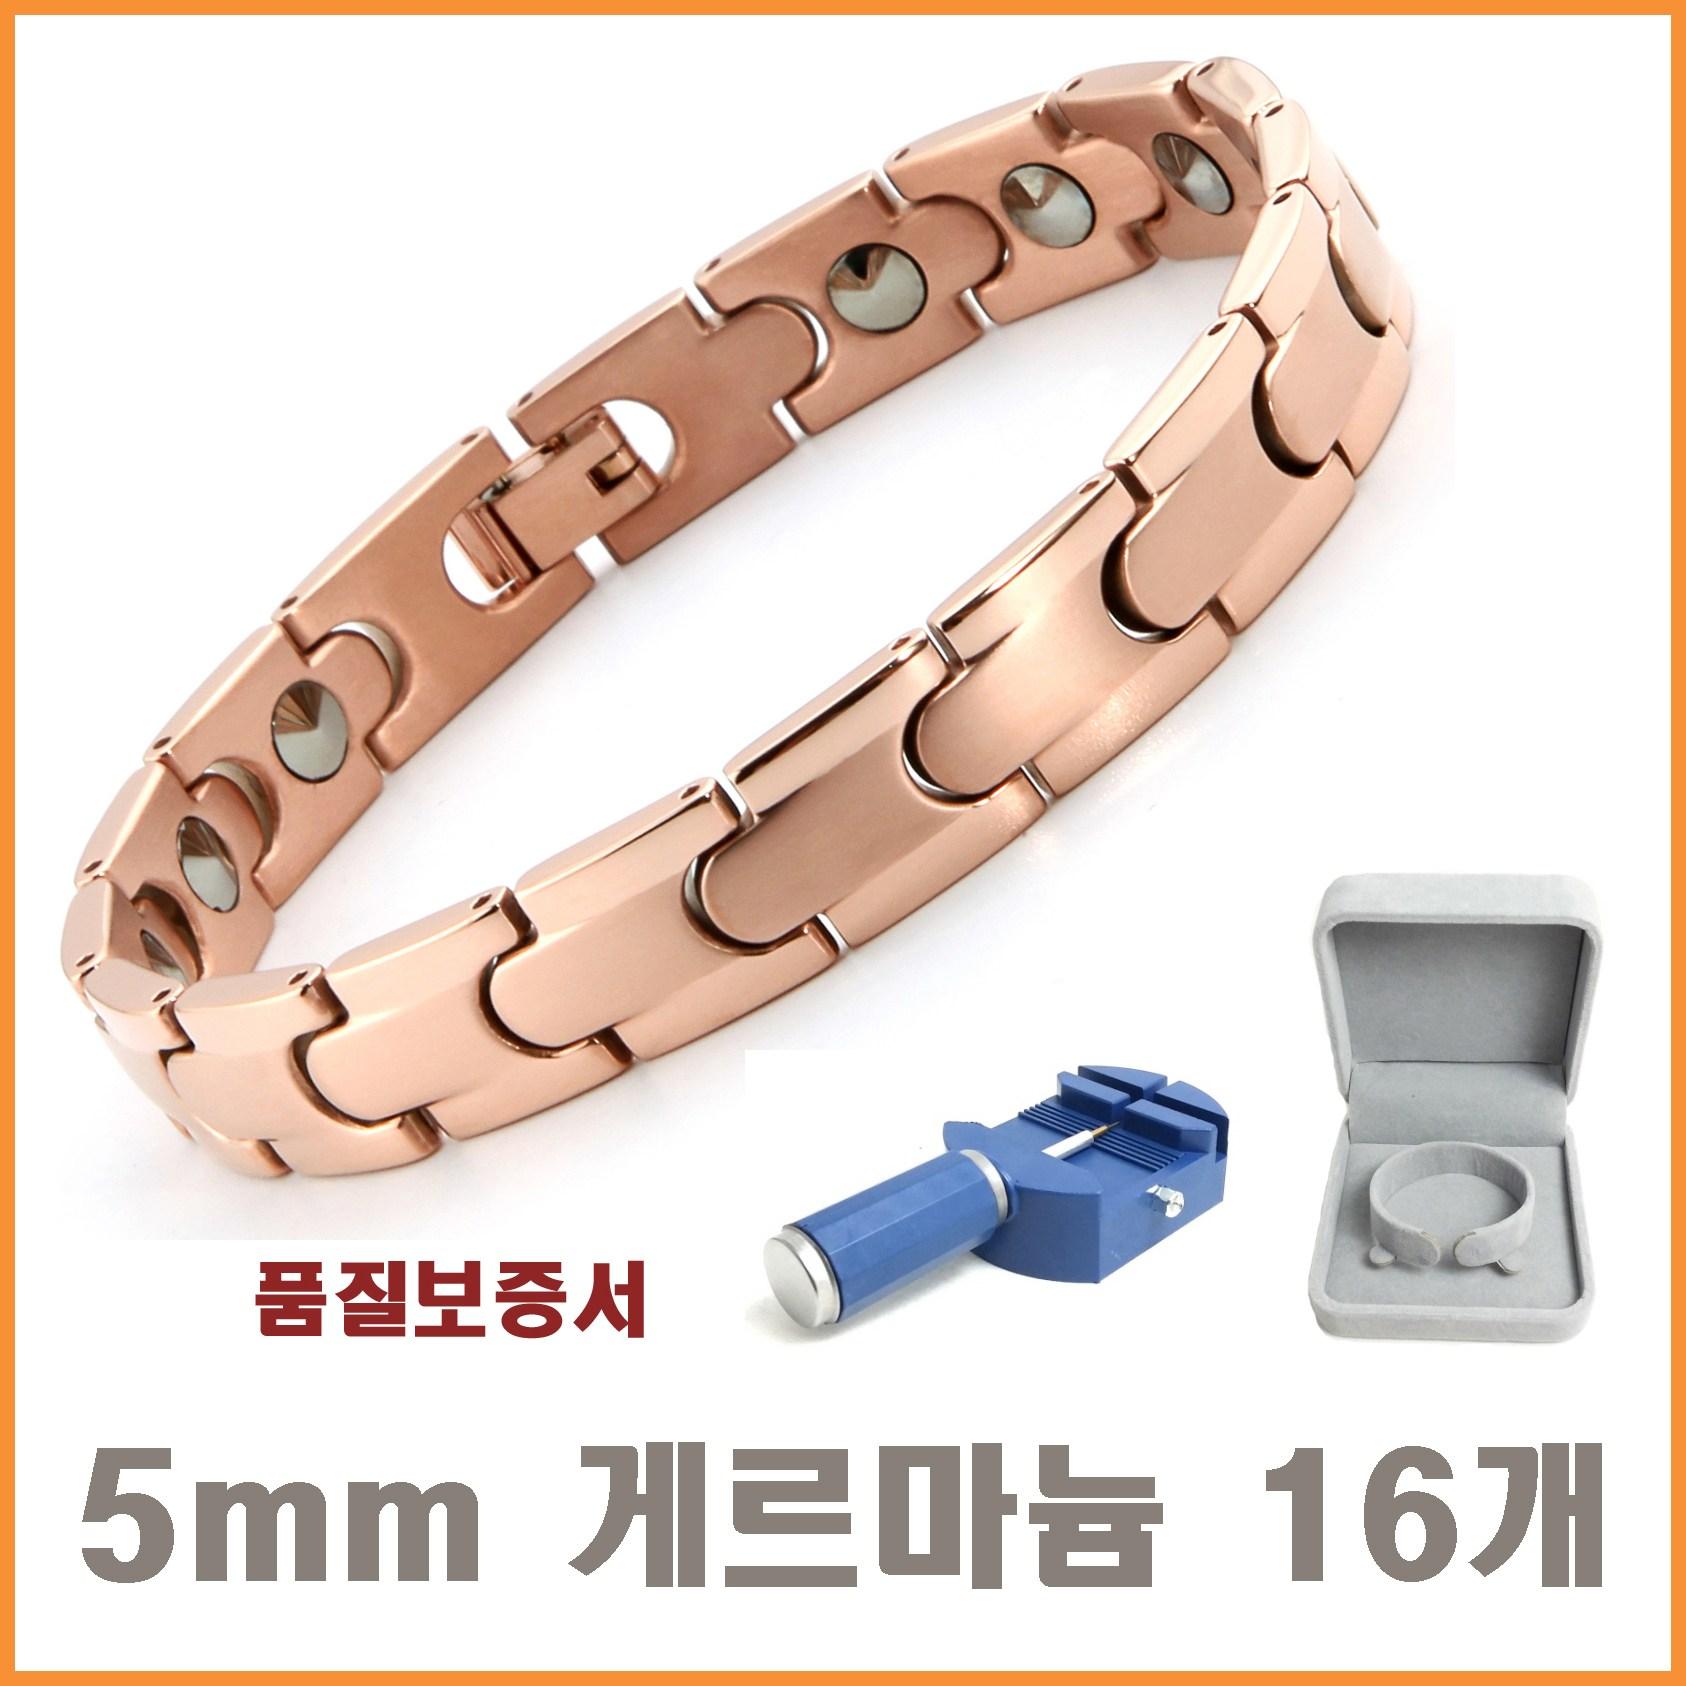 Woori 99.9998% 정품 게르마늄 건강 팔찌 WW9907 (써지컬스틸보다 가볍고 비싼 티타늄 소재), 1개